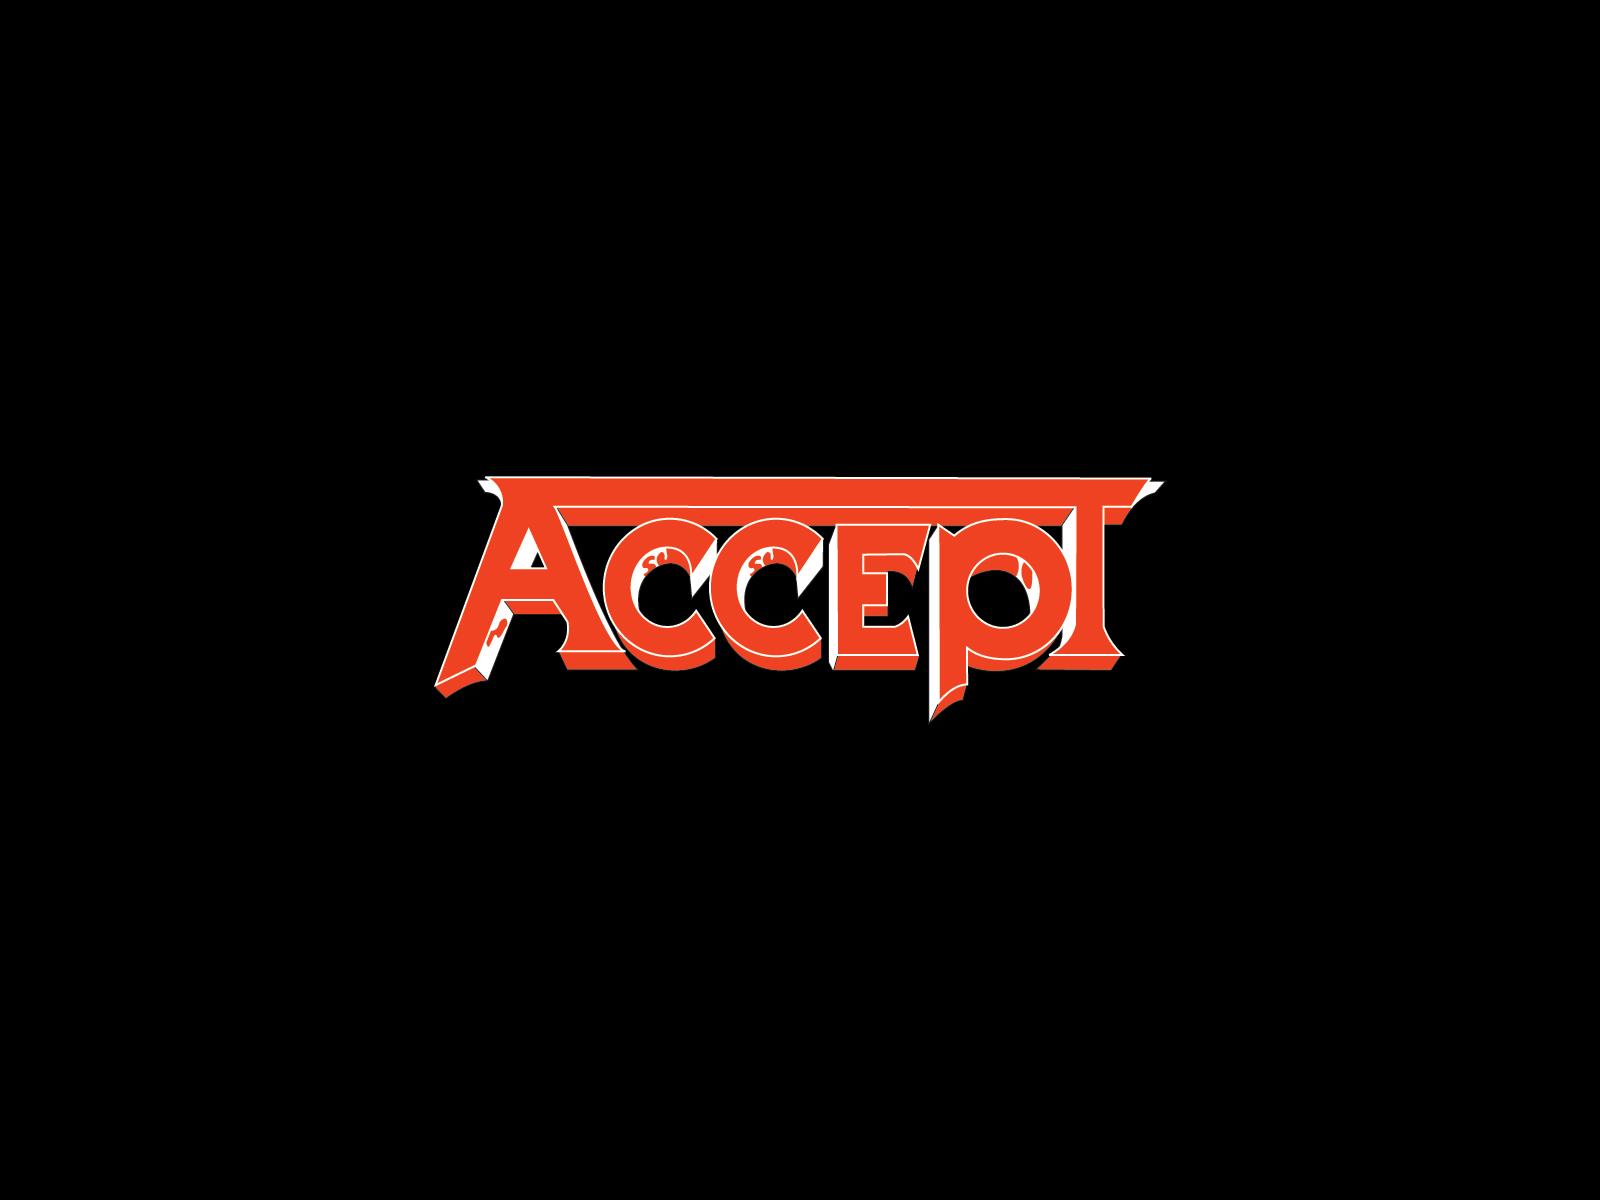 Accept Band Logo And Wallpaper